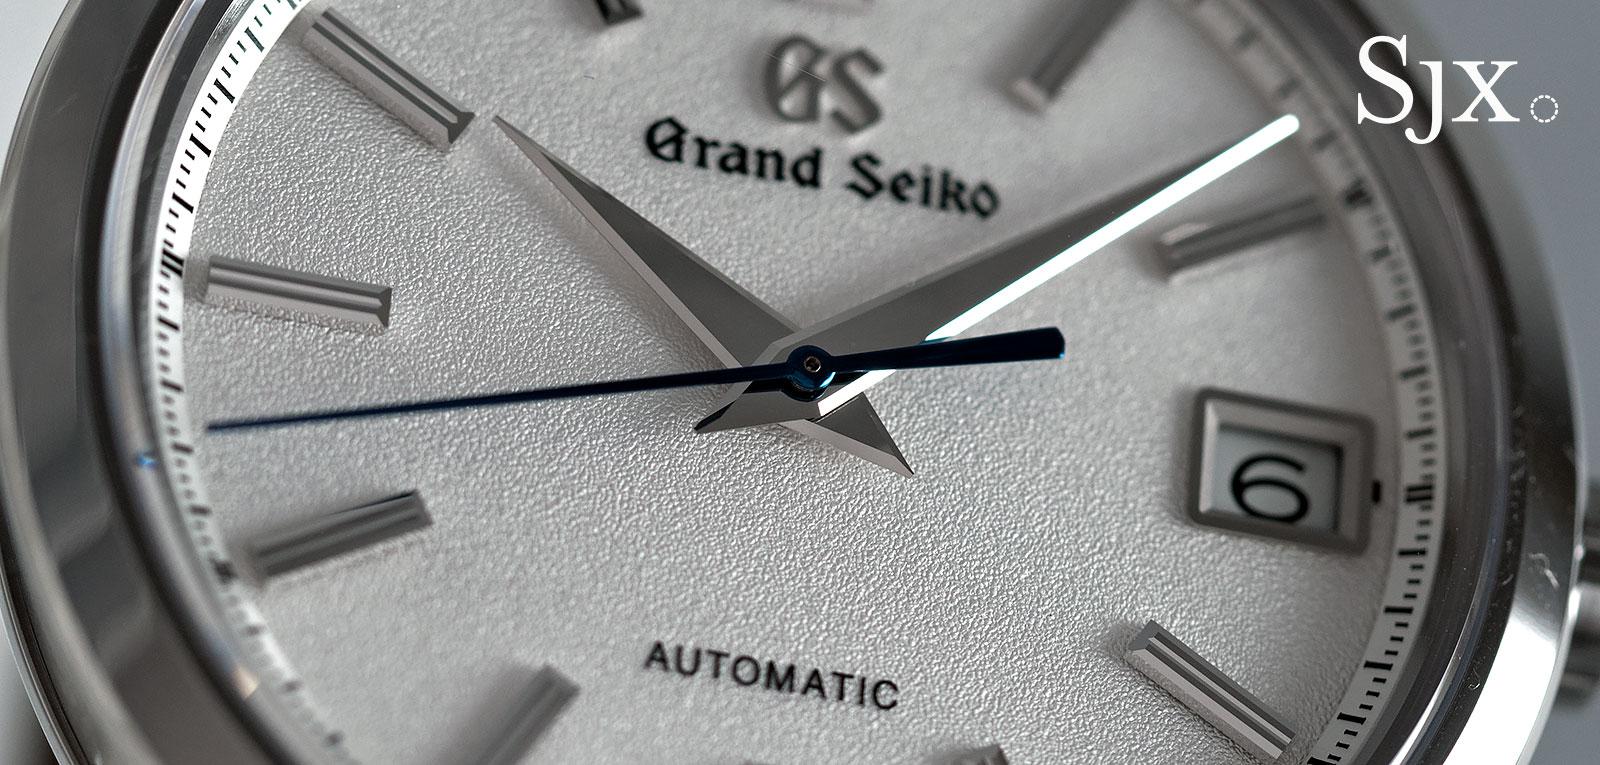 Grand Seiko SBGR305 titanium 7